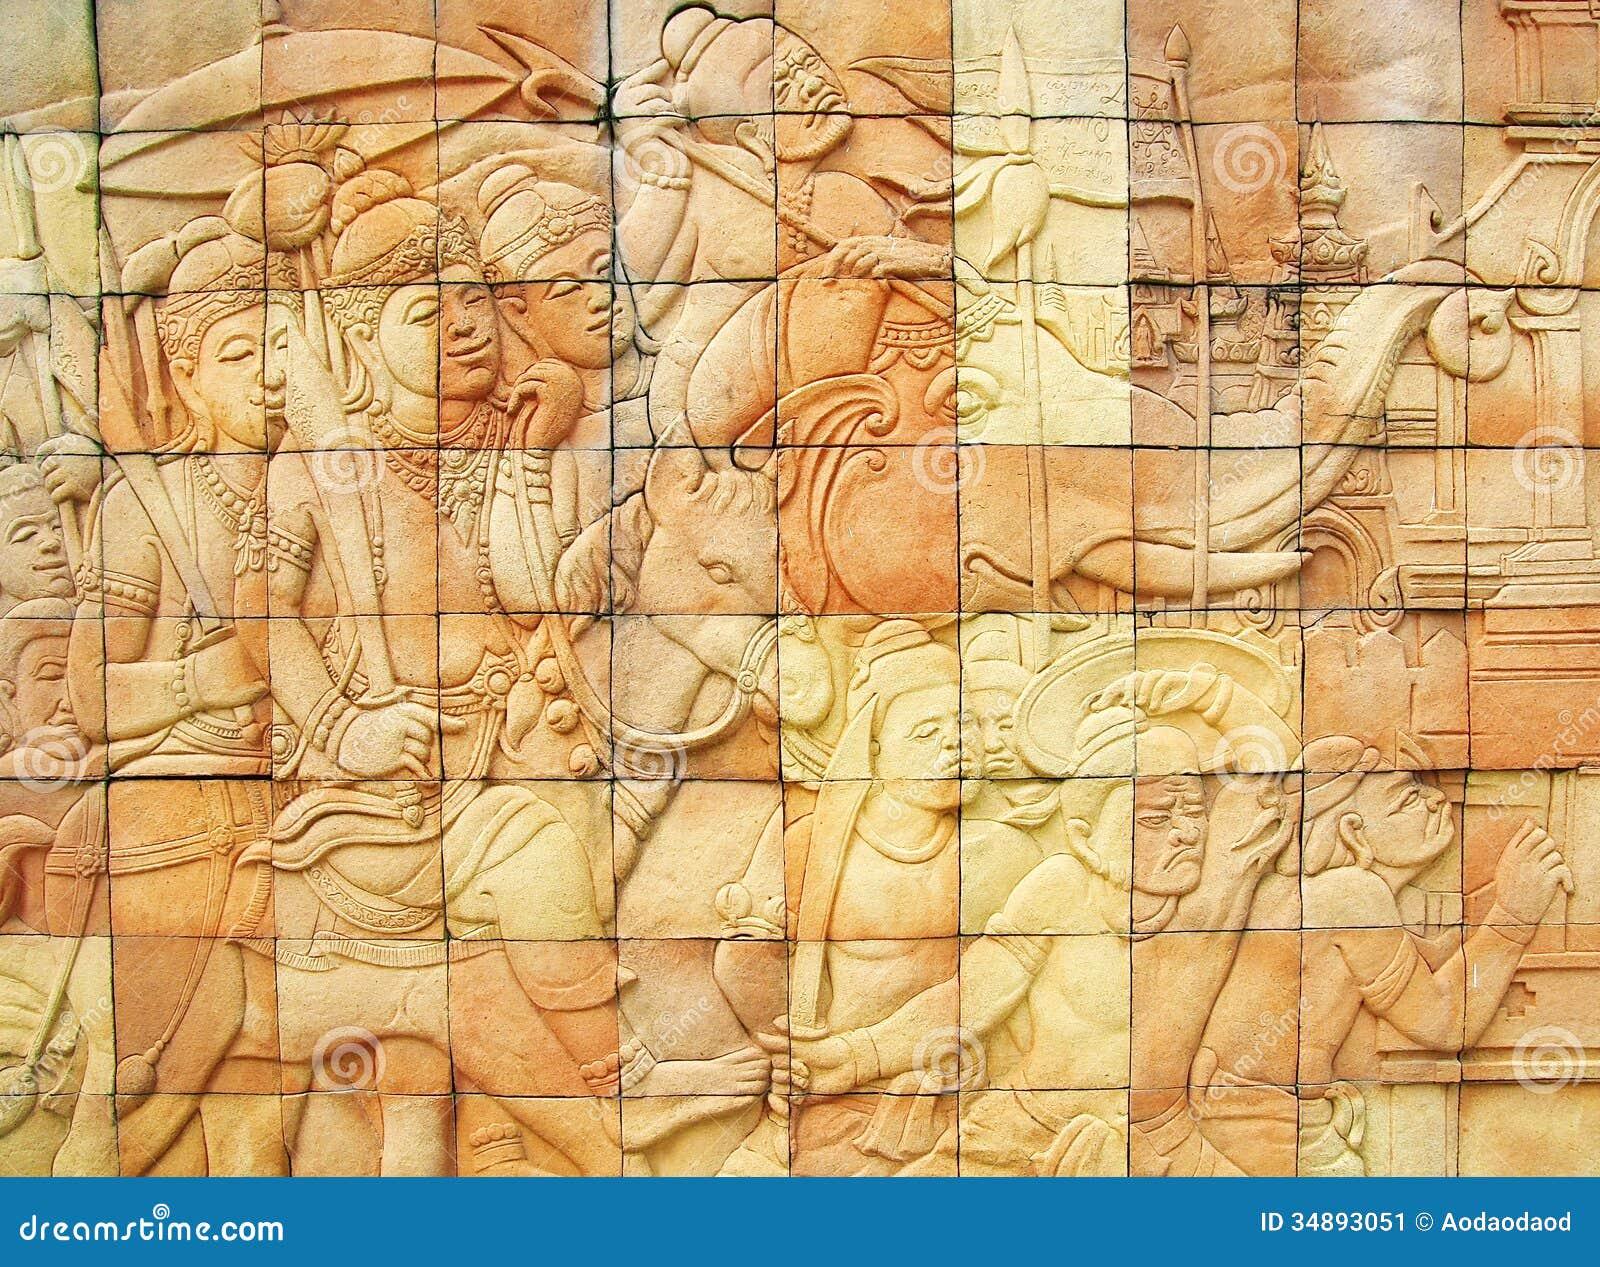 Stone Wall Art thailand art stone wall stock photography - image: 34893042